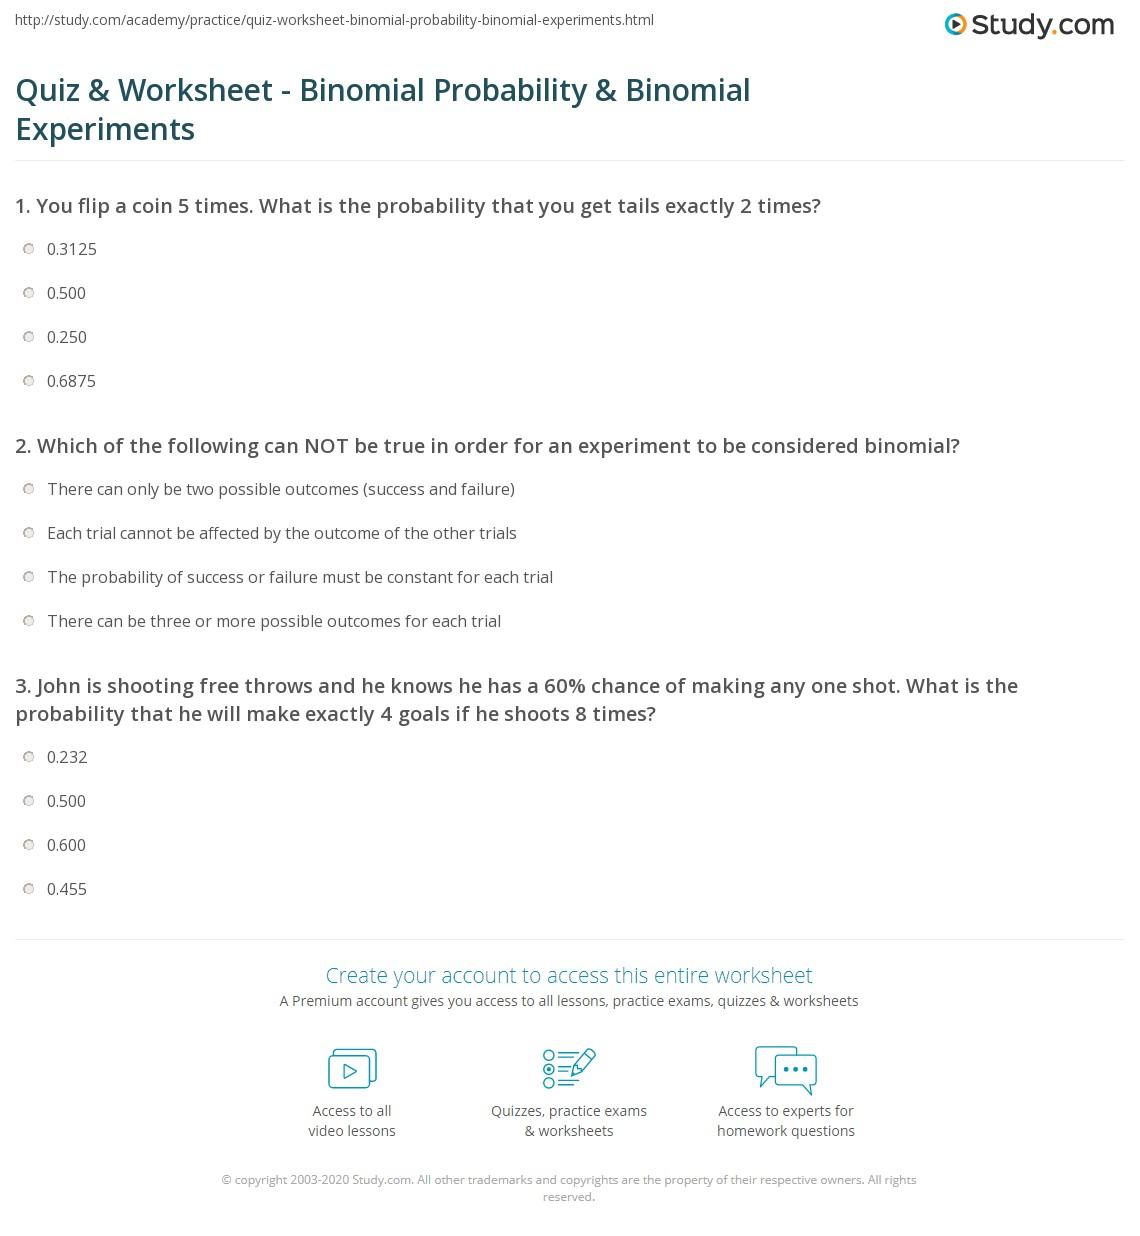 Quiz Worksheet Binomial Probability Binomial Experiments – Binomial Probability Worksheet